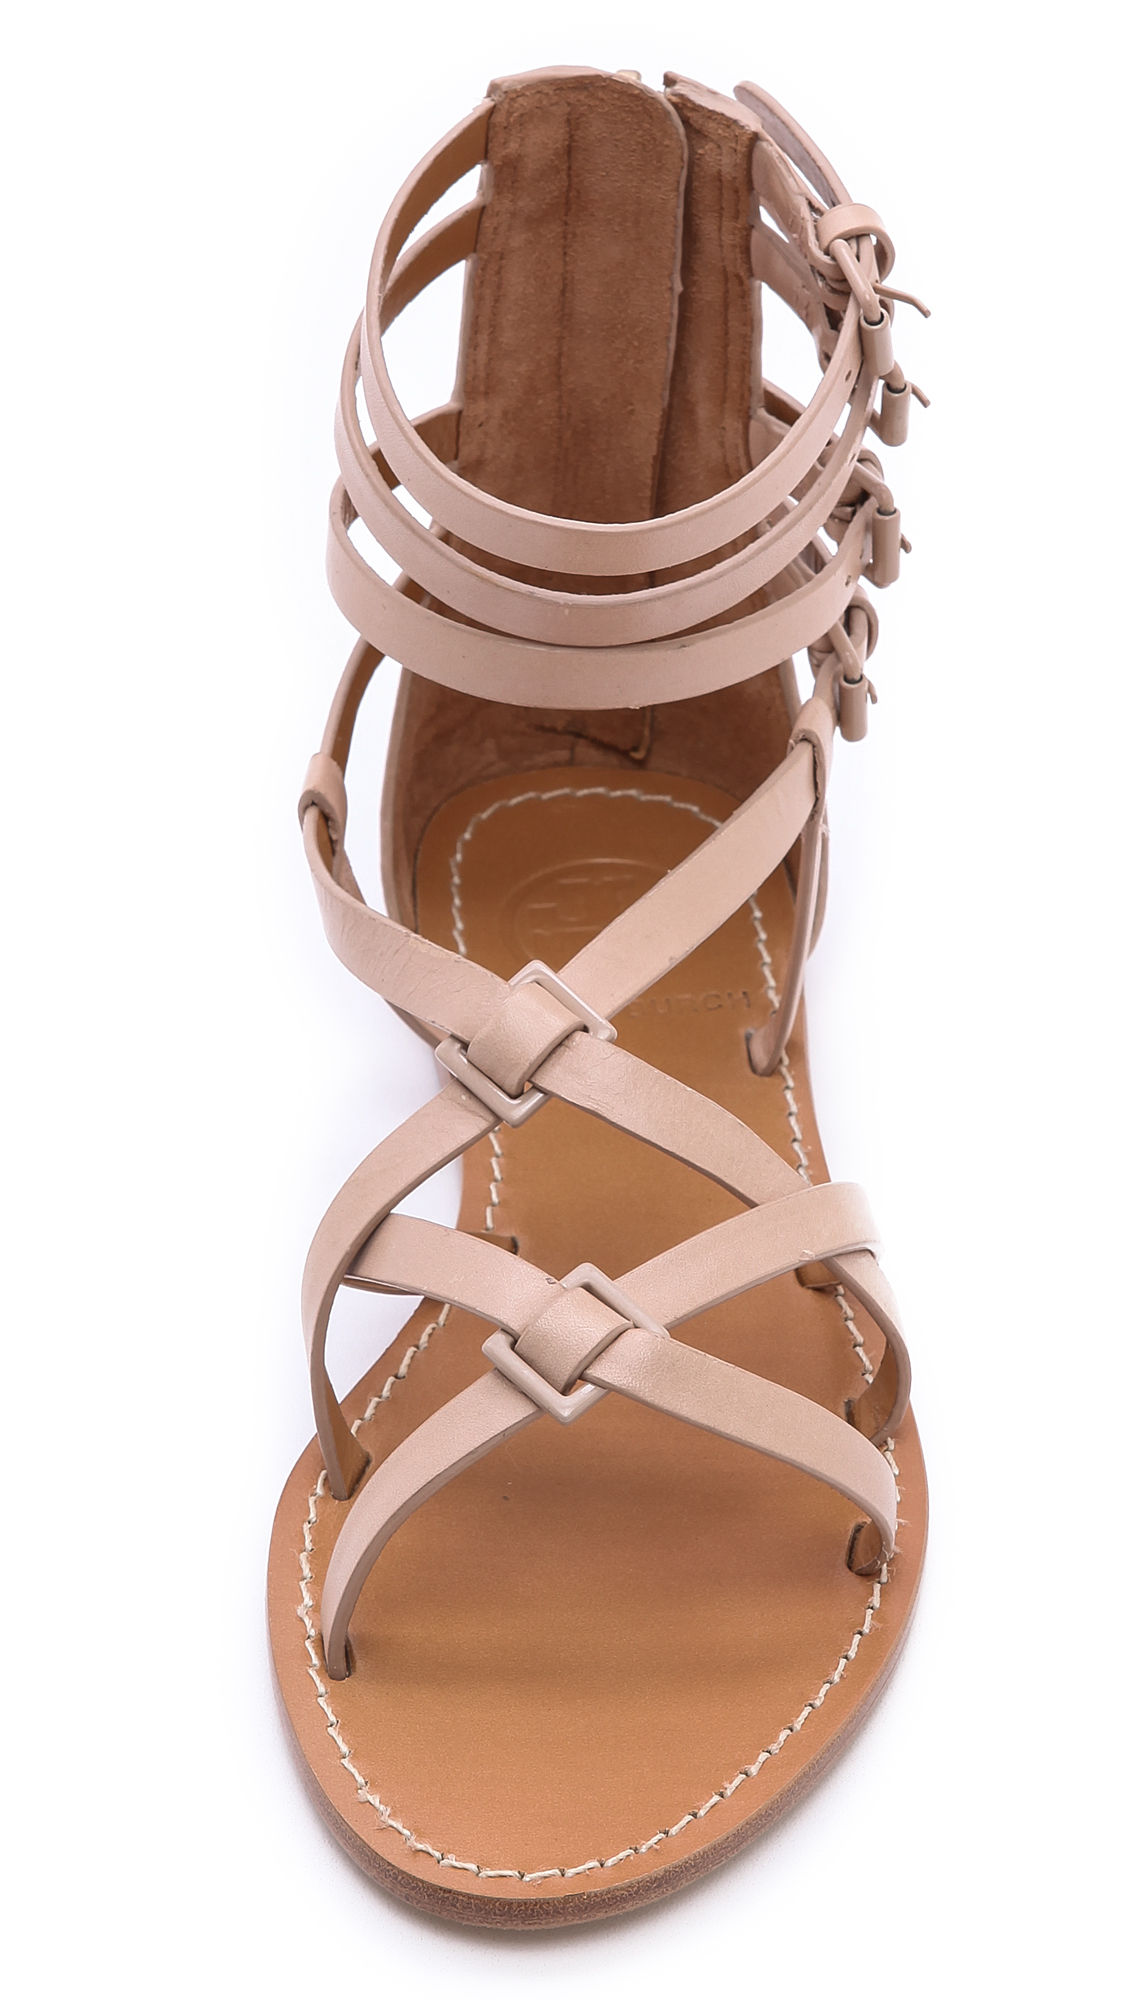 63709ffa70bb56 Tory Burch Lucas Flat Sandals